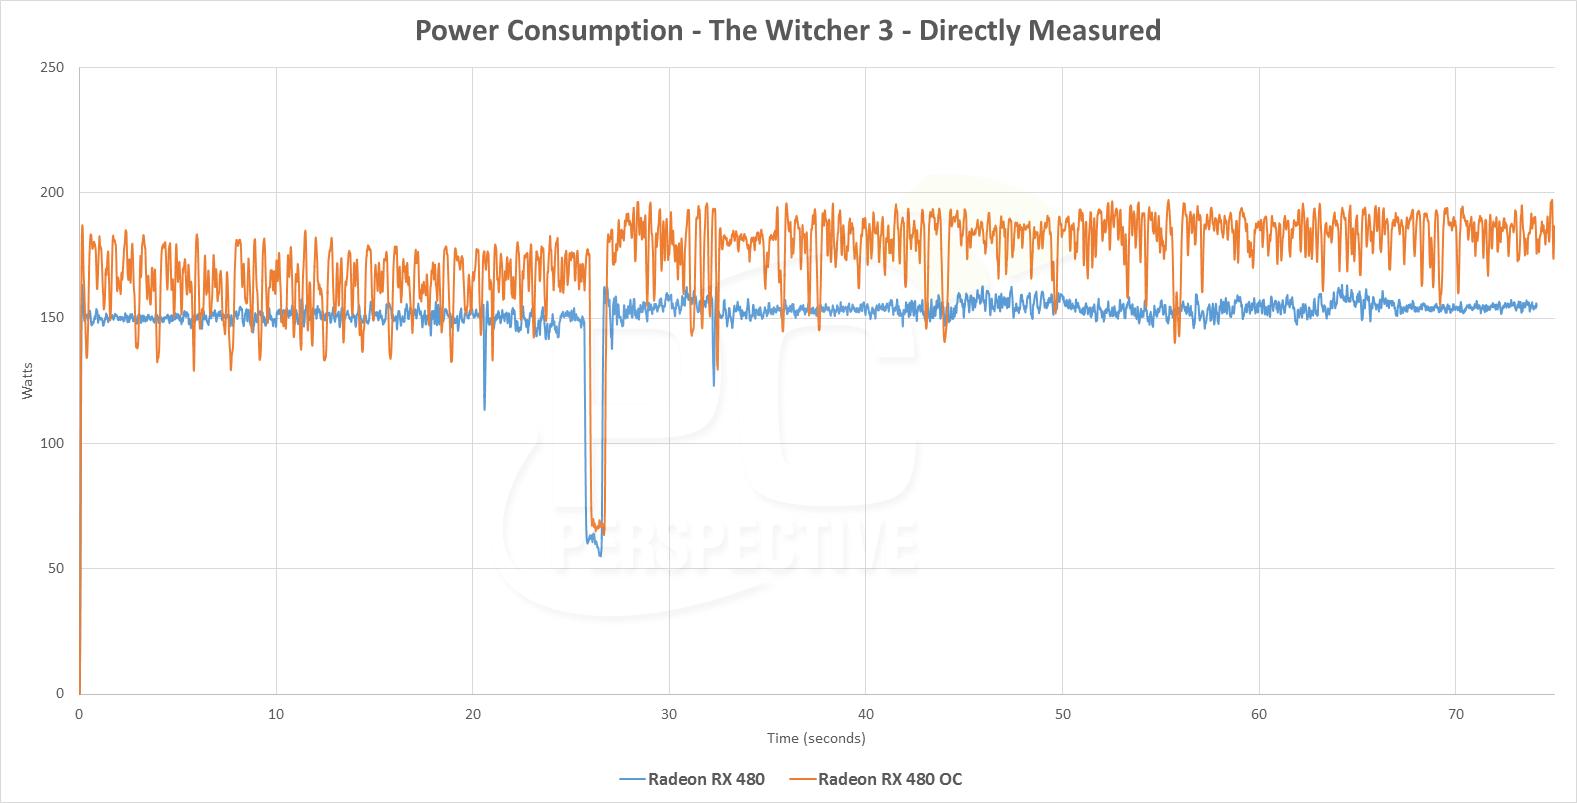 poweroc-witcher3.png